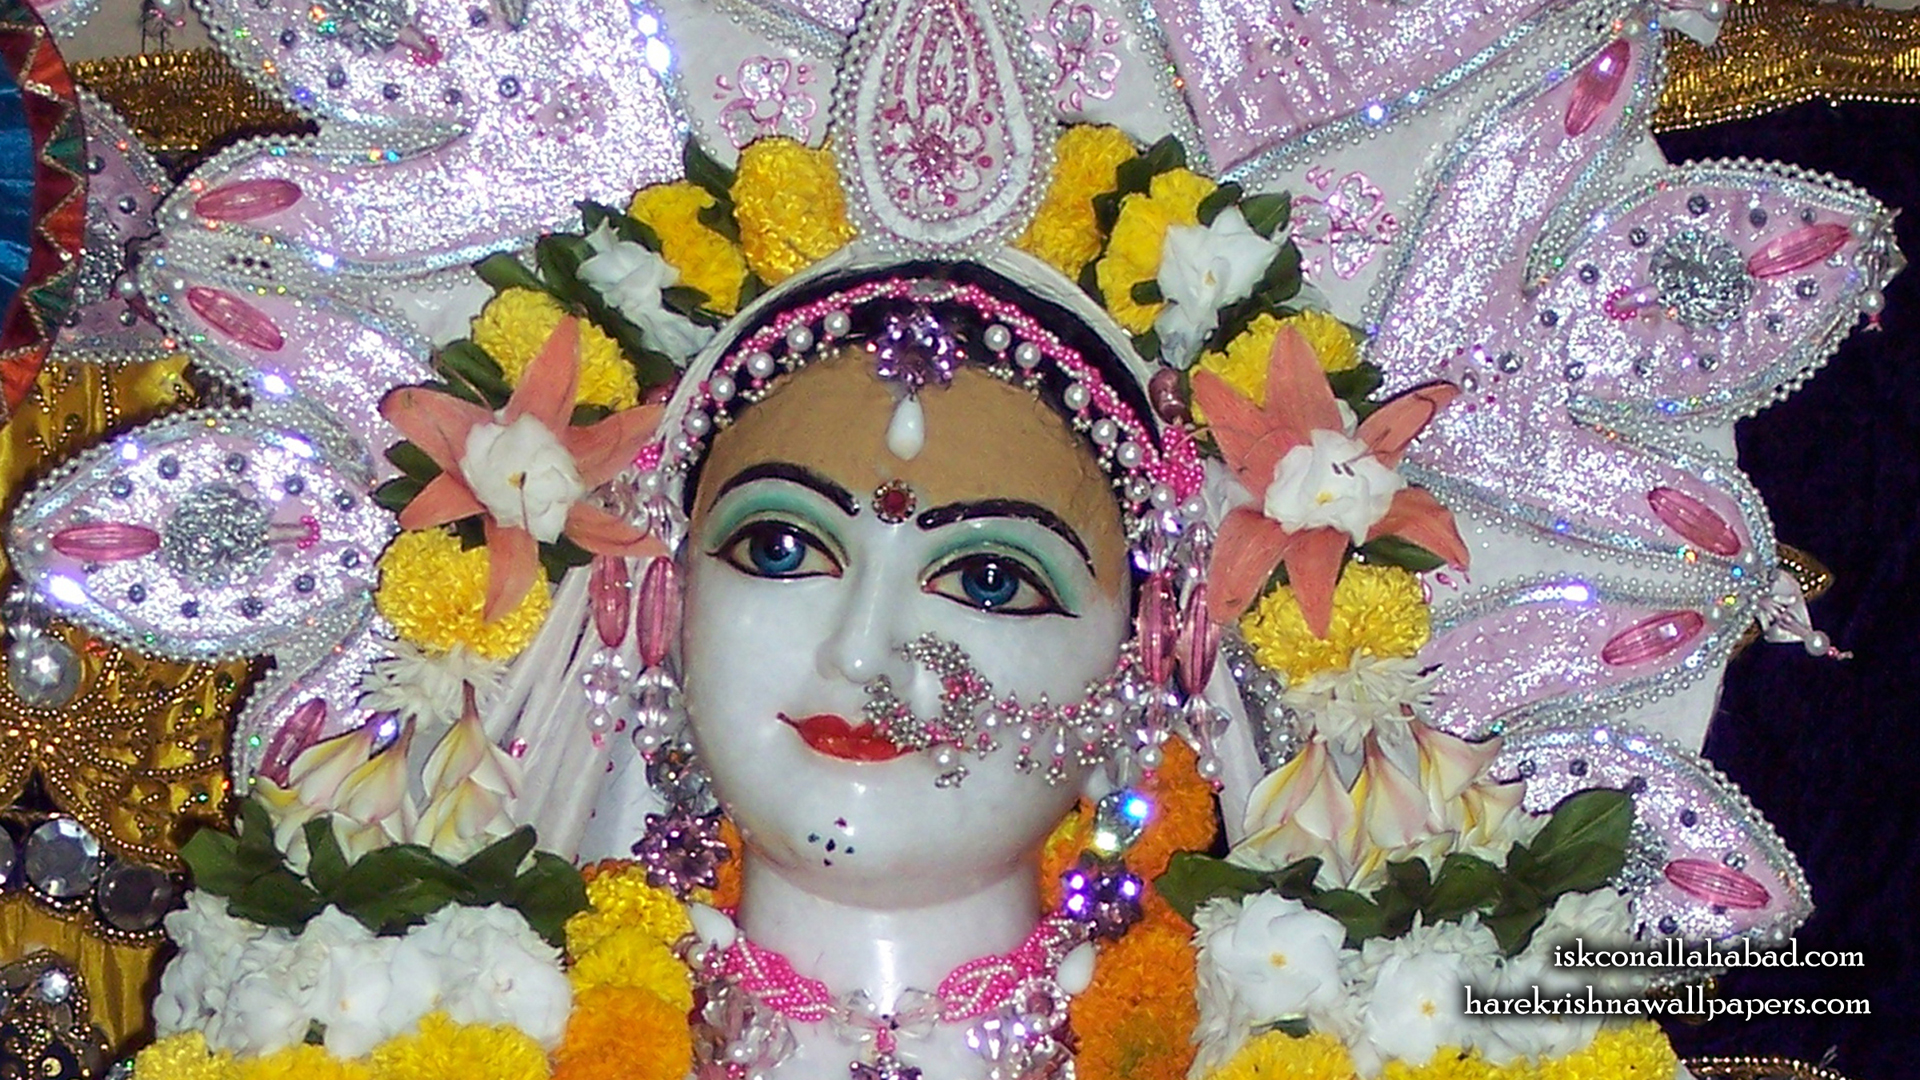 Sri Radha Close up Wallpaper (003) Size 1920x1080 Download